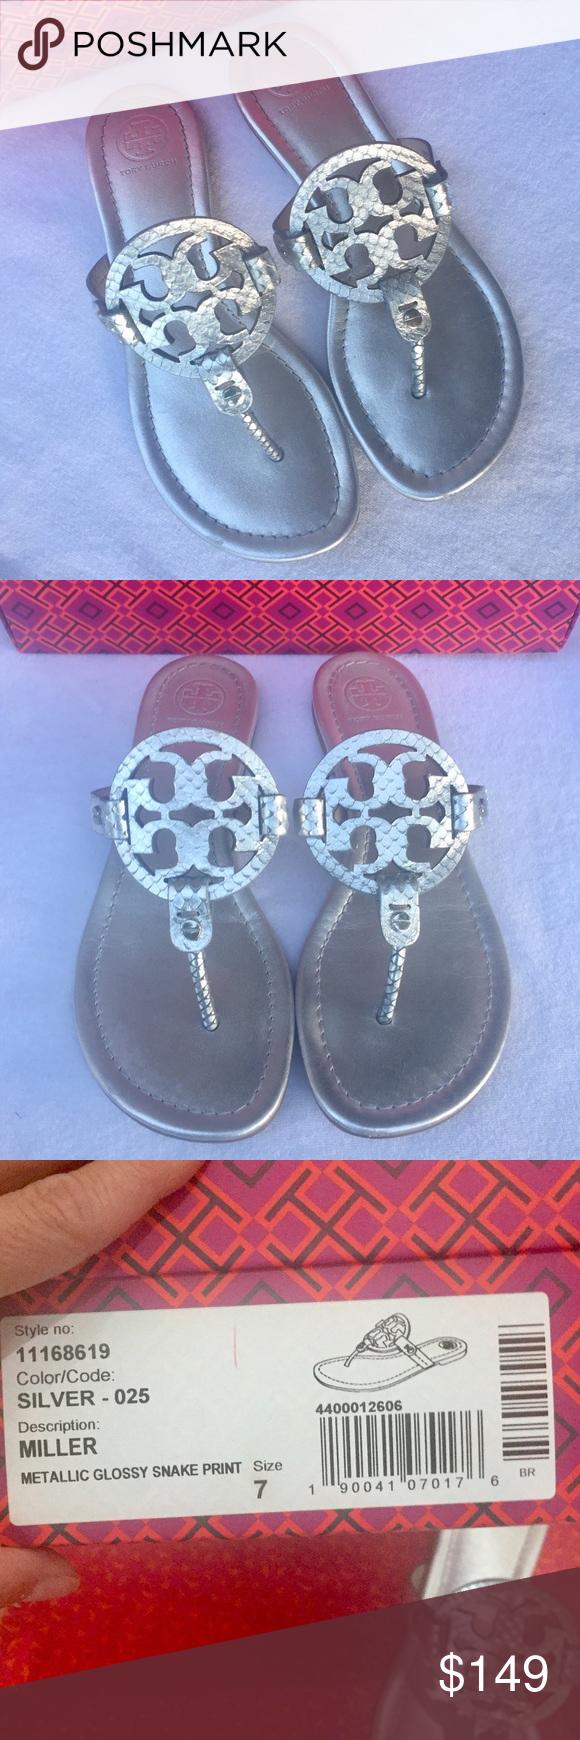 478cd1c684a6f1 Tory Burch Miller Sandals Tory Burch Miller Sandals. Color  Silver Metallic  Snake Print.